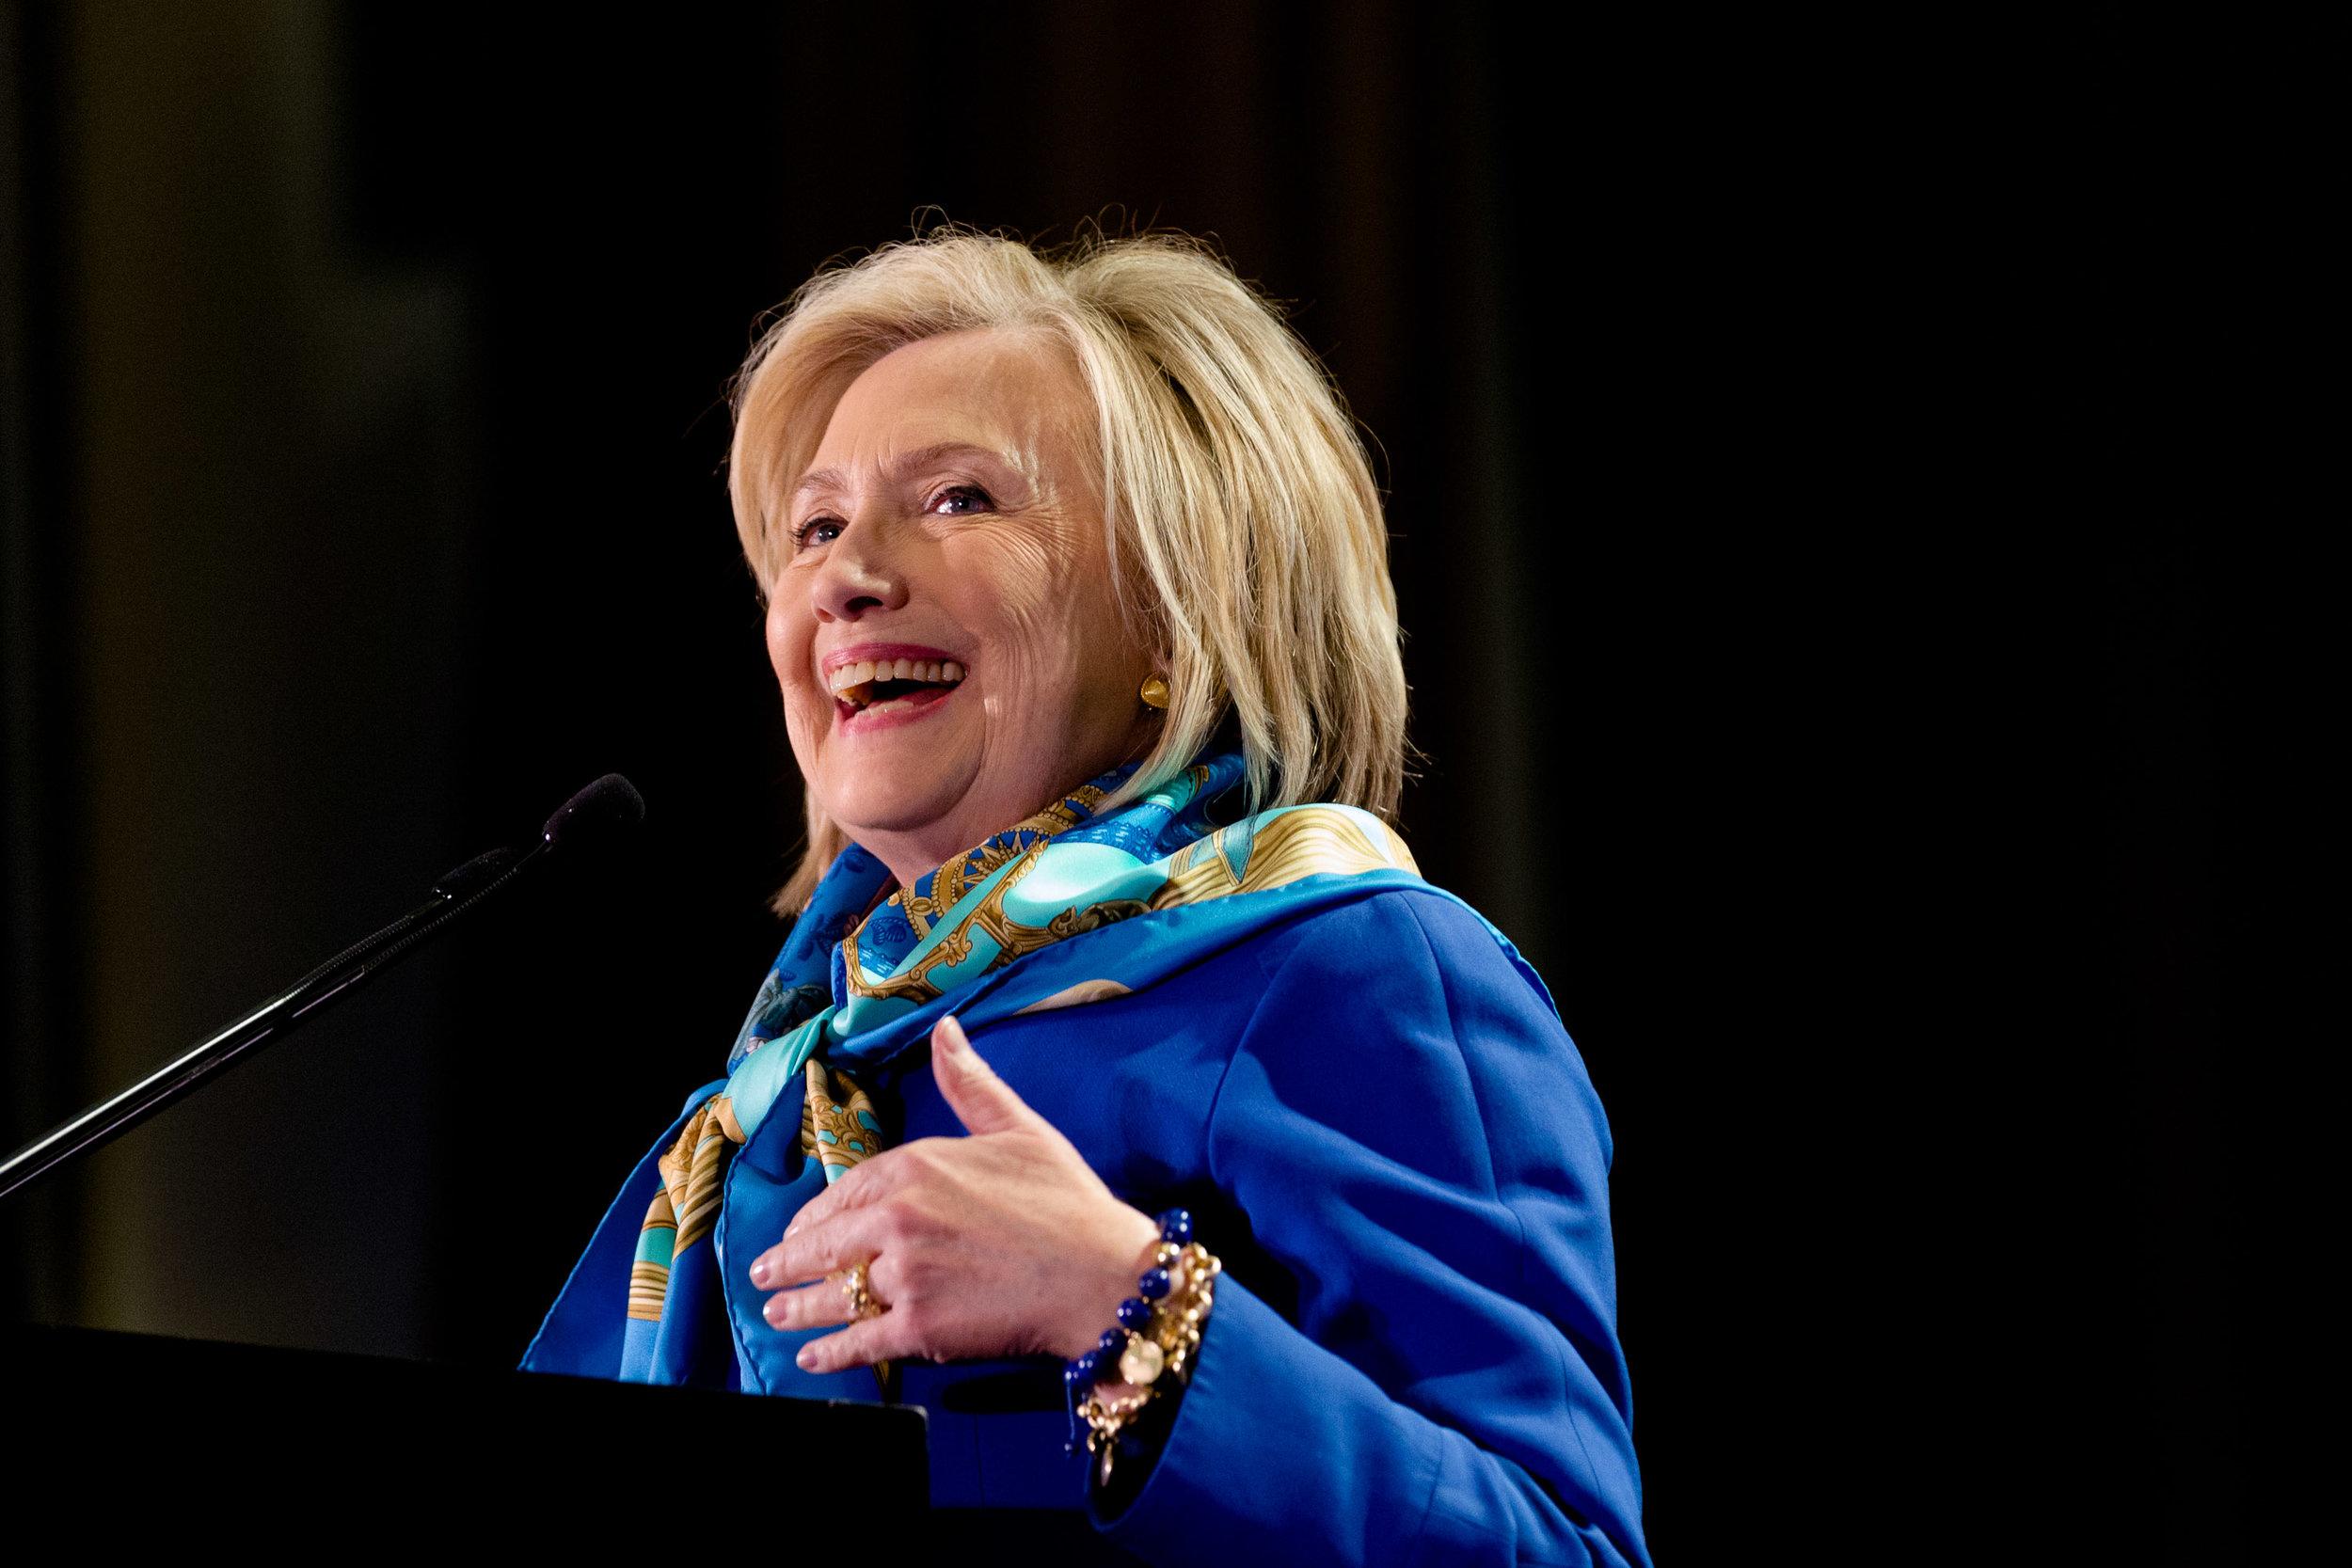 Hilary Clinton as the keynote speaker for the Regional Plan Association Assembly, New York, New York April 27, 2018.